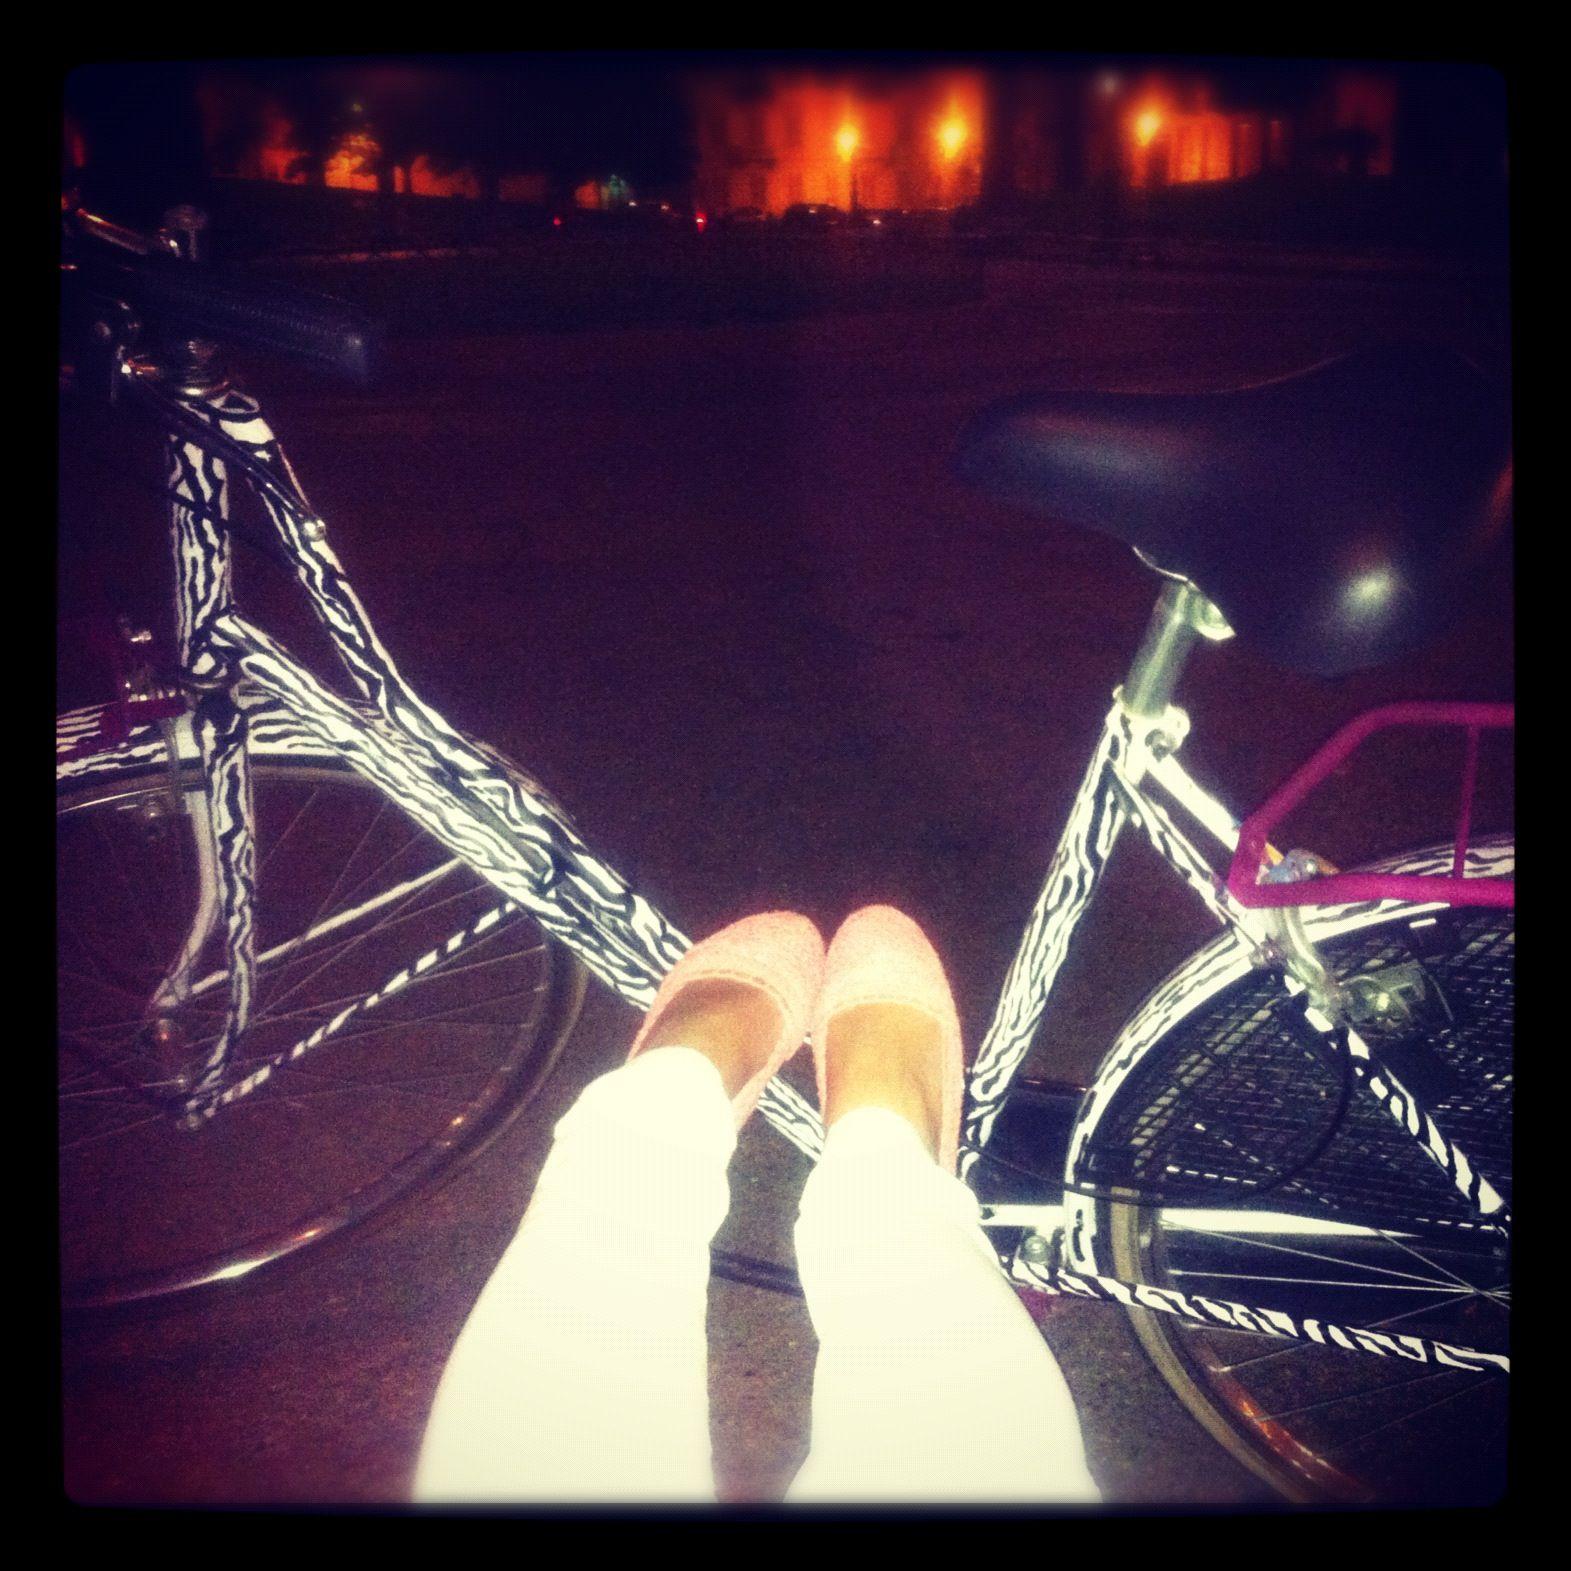 My zebra bicycle